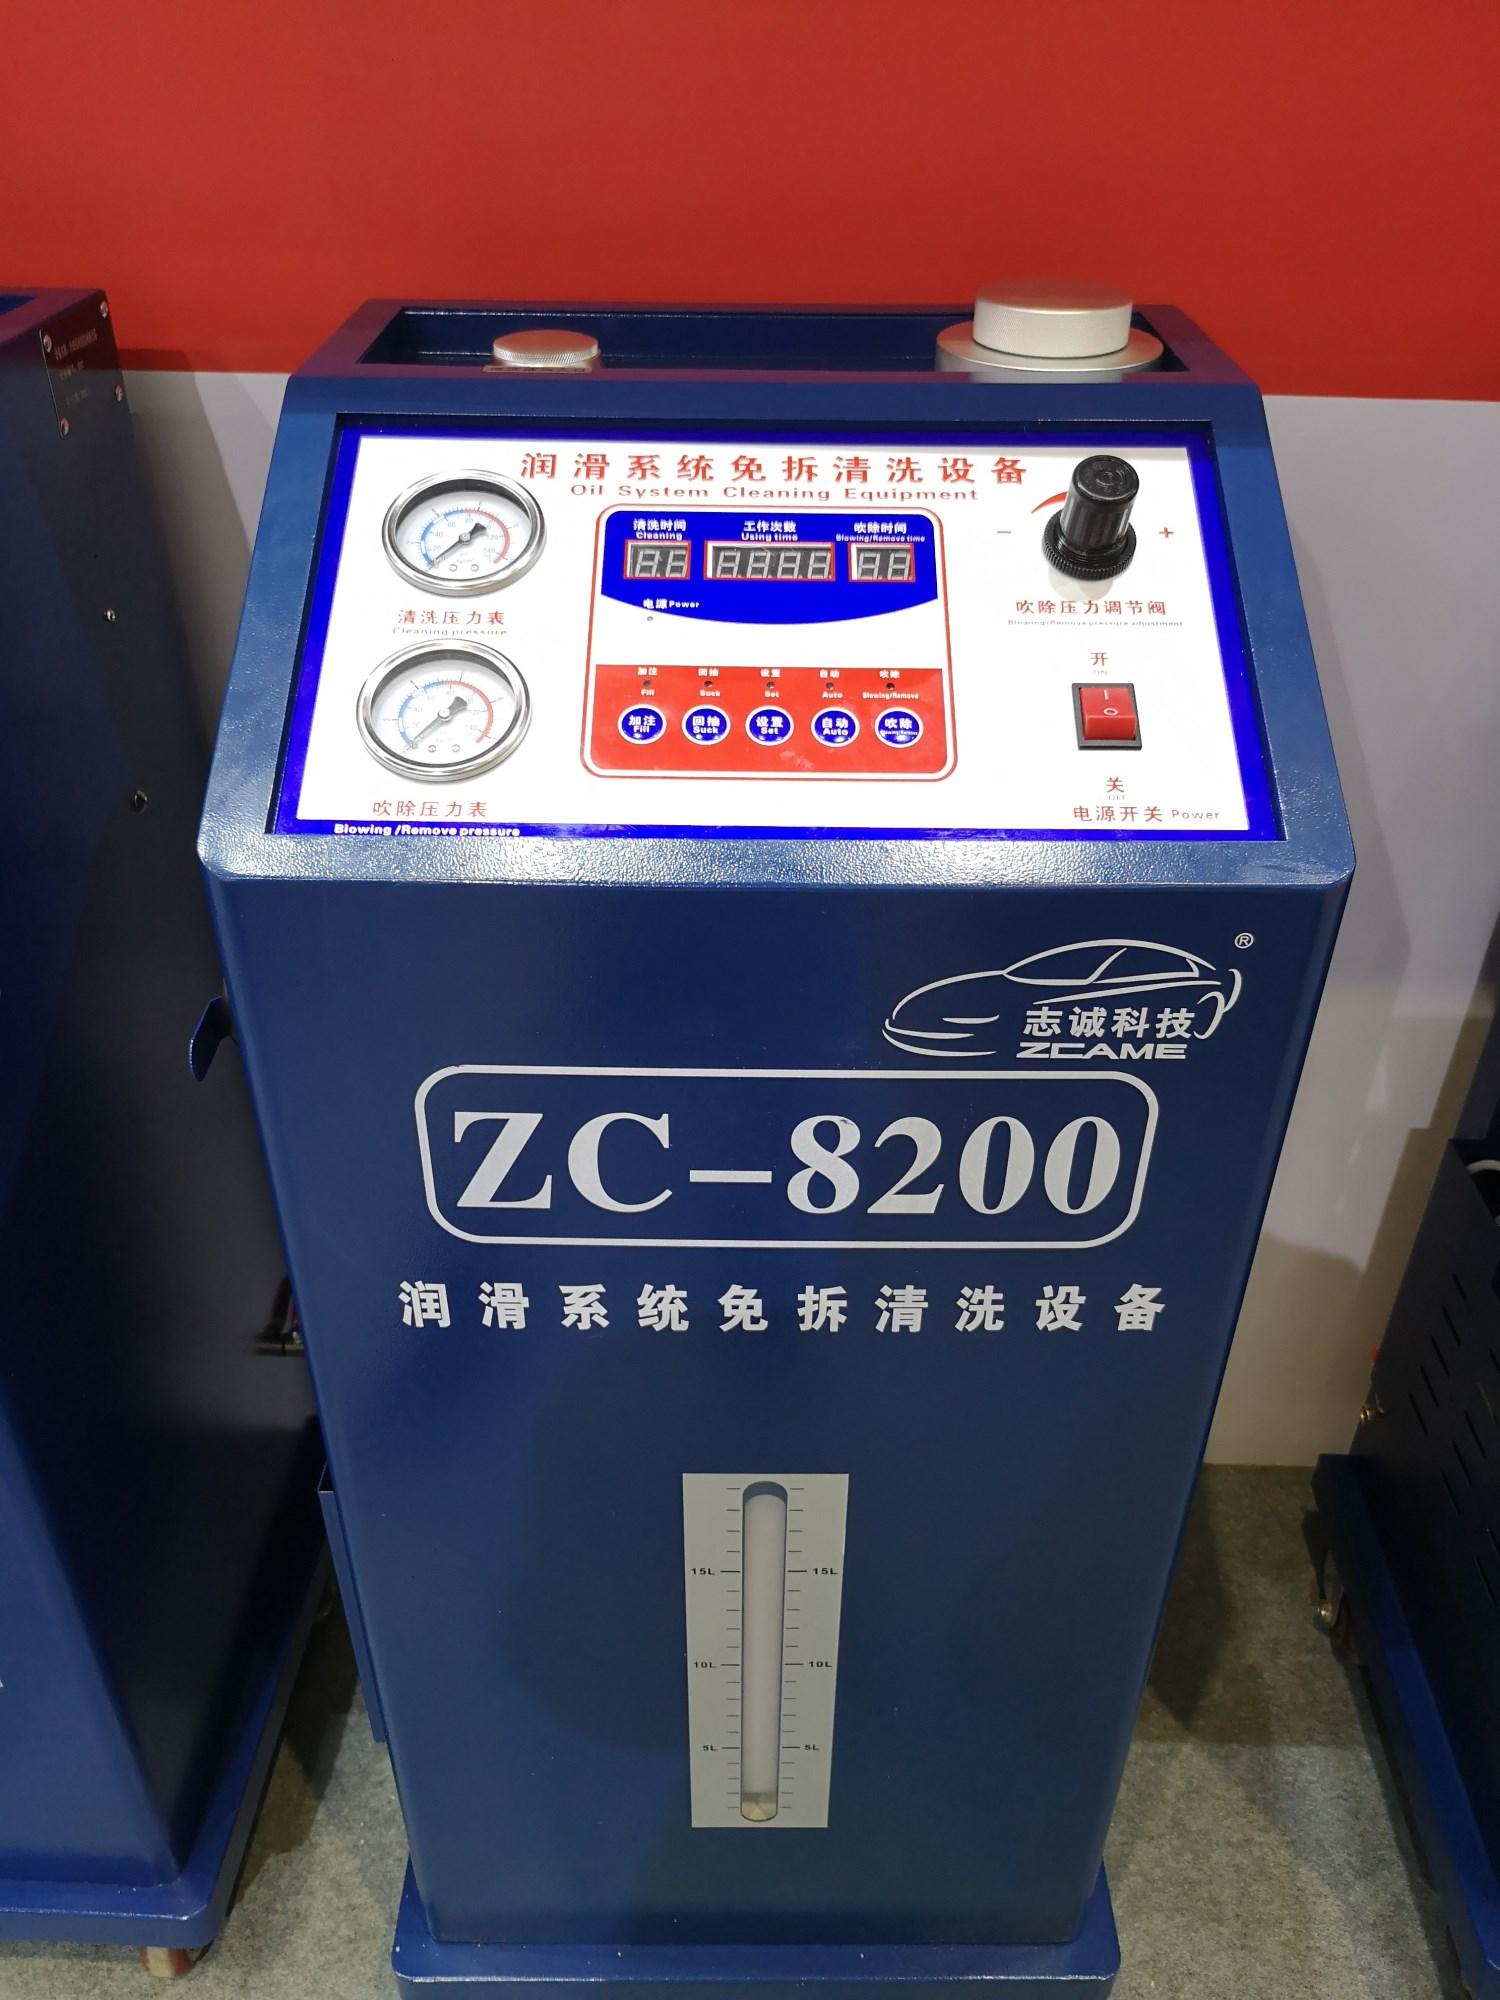 ZC-8200滑清洗专用设备